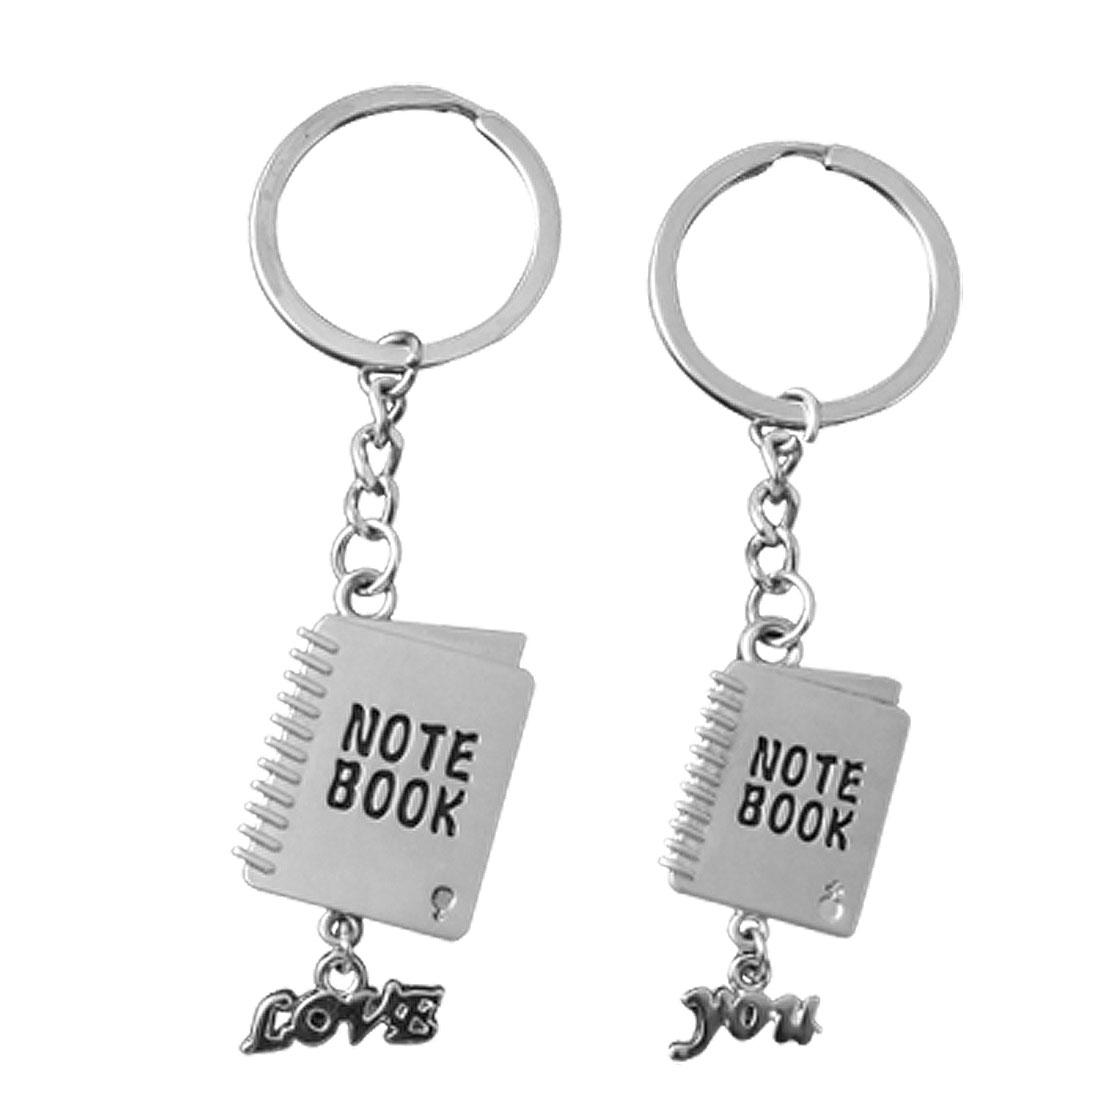 Pair Notebook Shaped Metal Key Rings w Word for Lovers